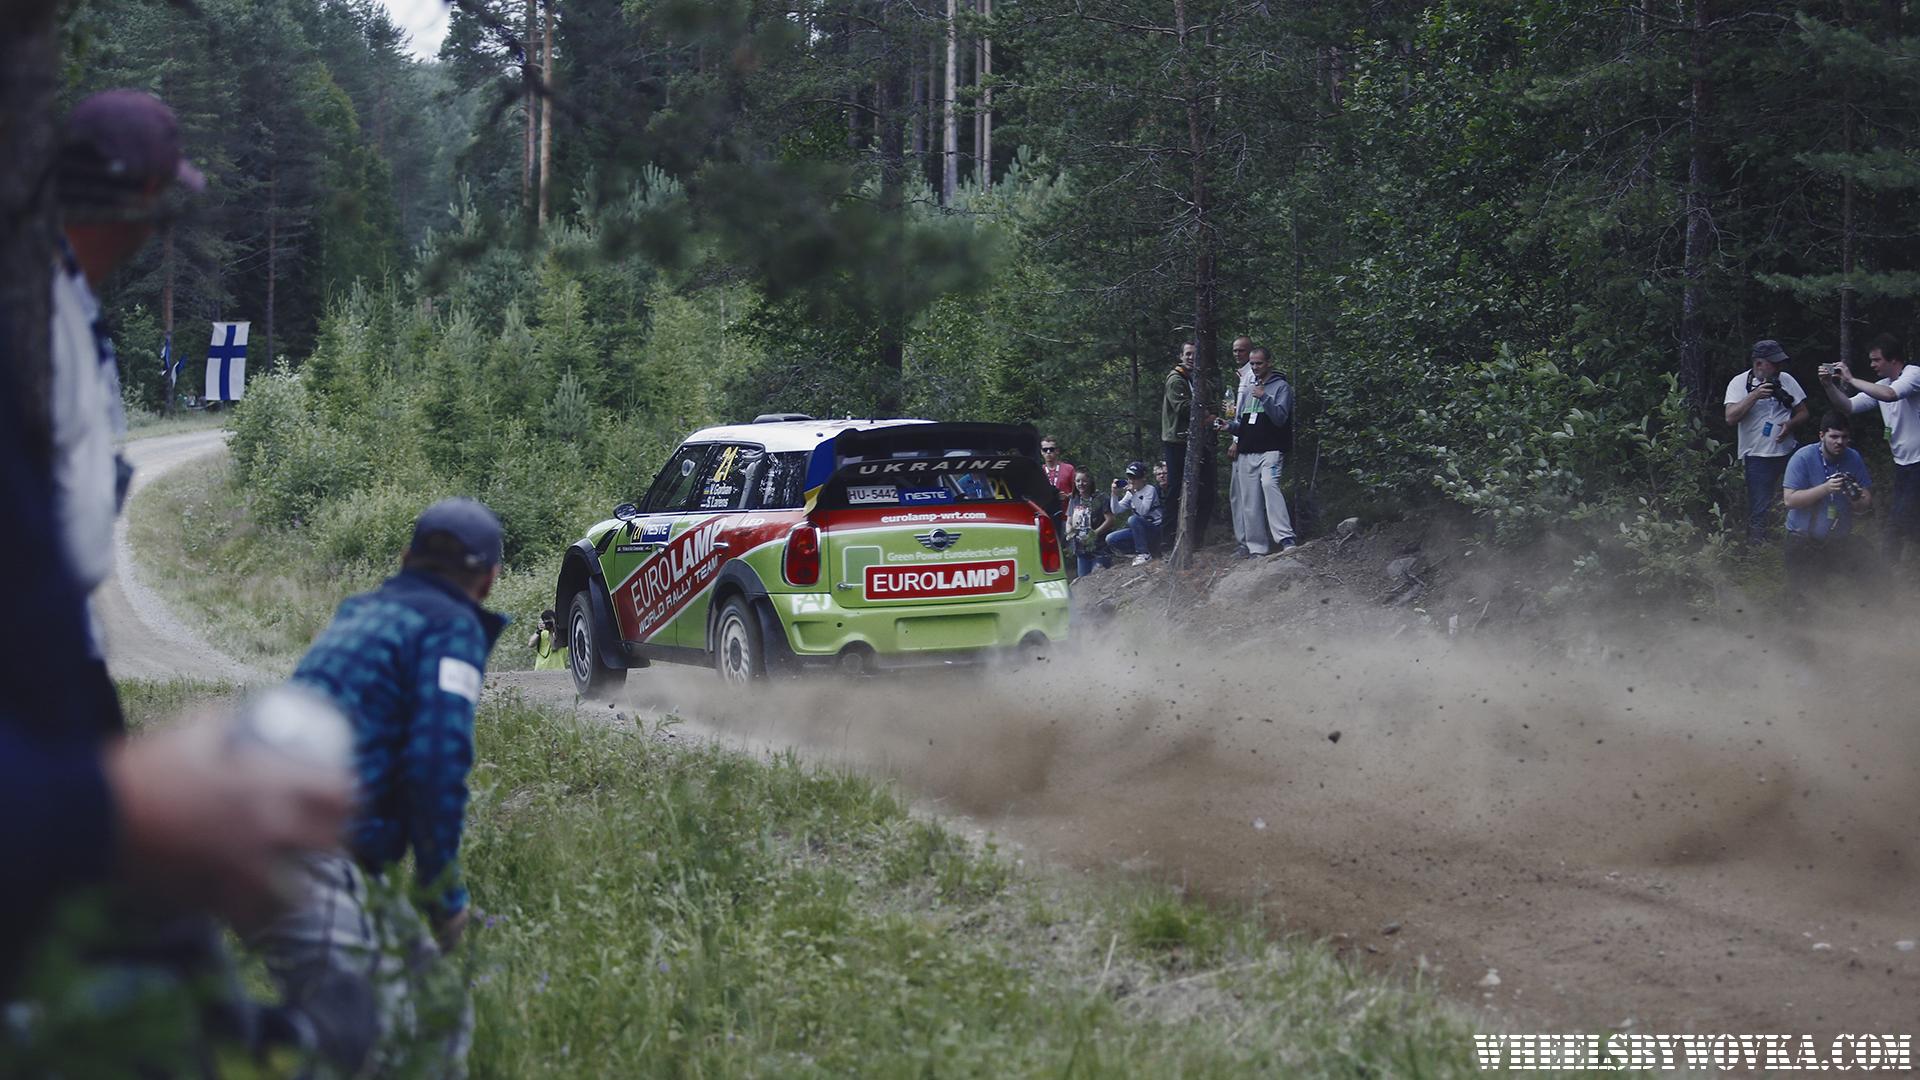 wrc-neste-rally-finalnd-2017-by-wheelsbywovka-8